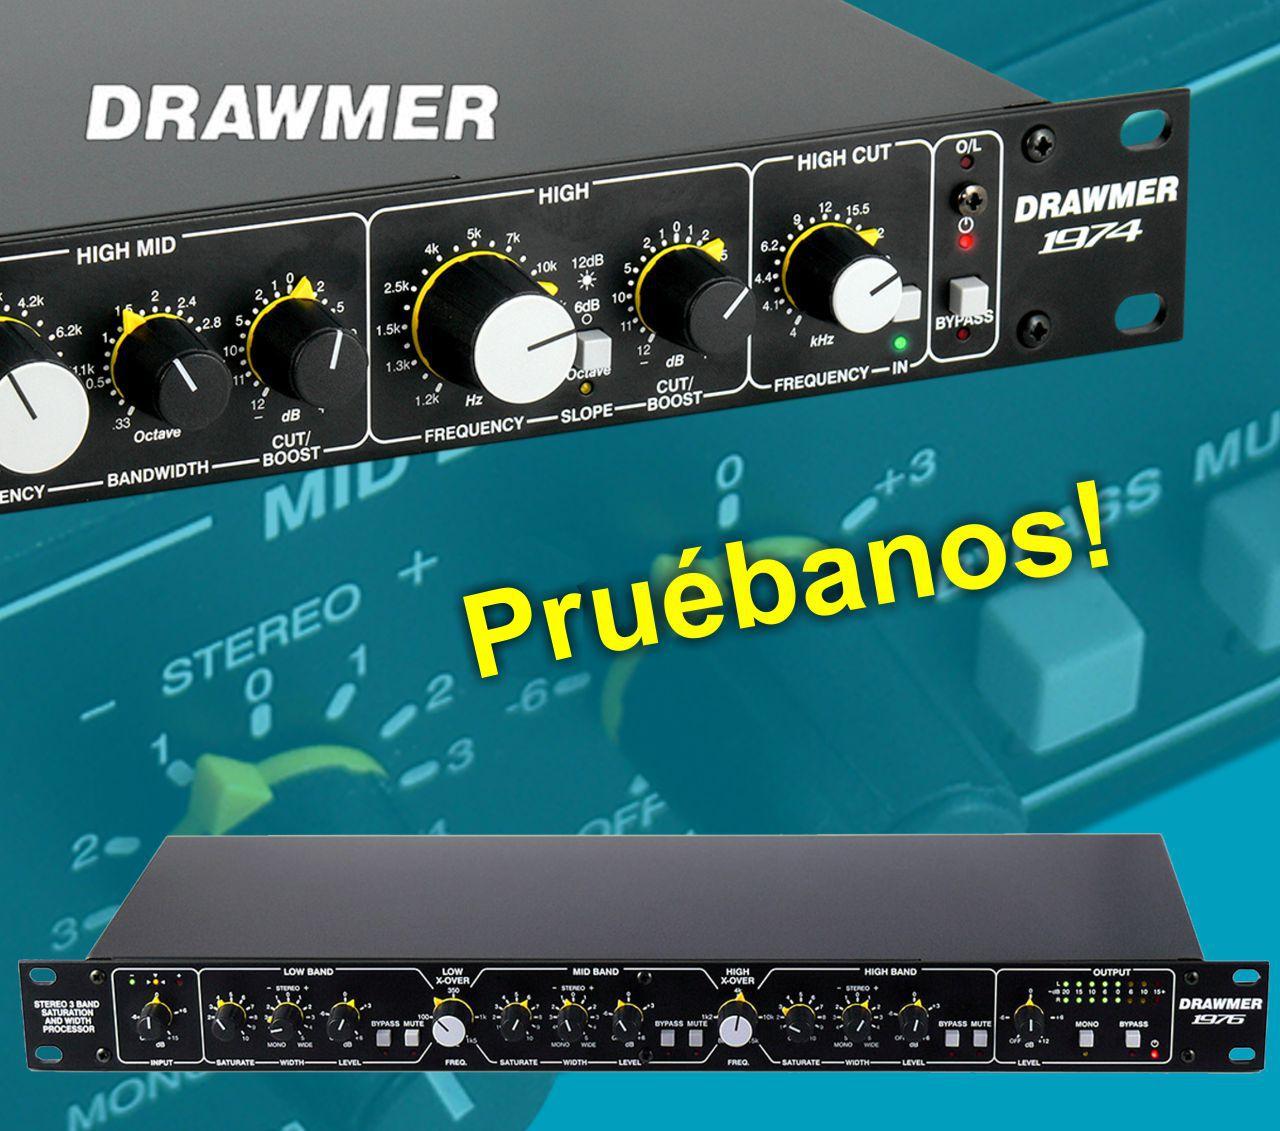 Noticia probar Drawmer